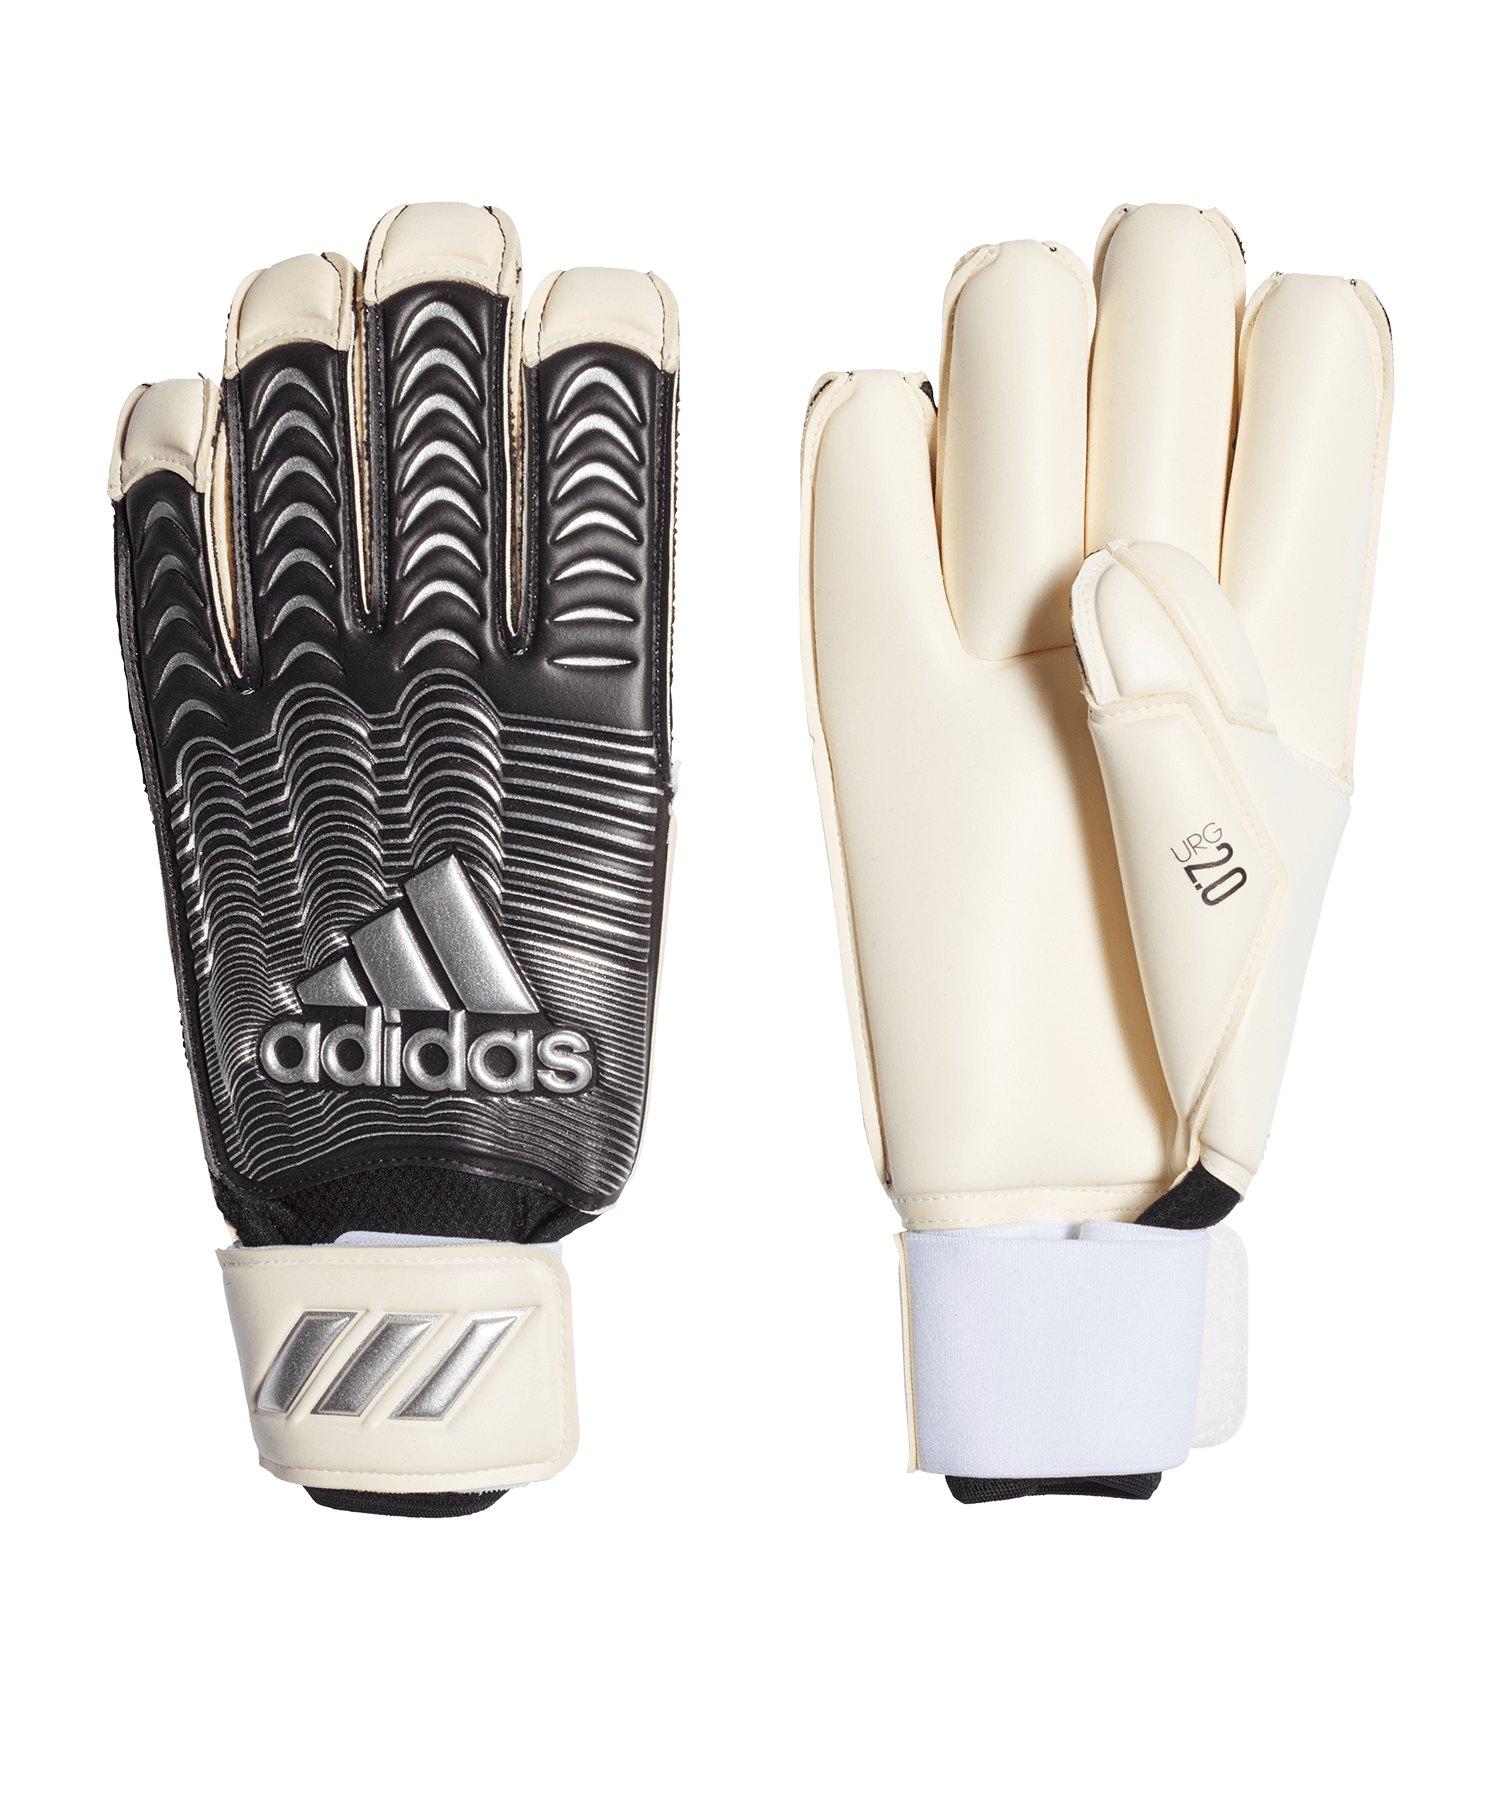 adidas Classic Pro FT TW-Handschuh Weiss Silber - weiss